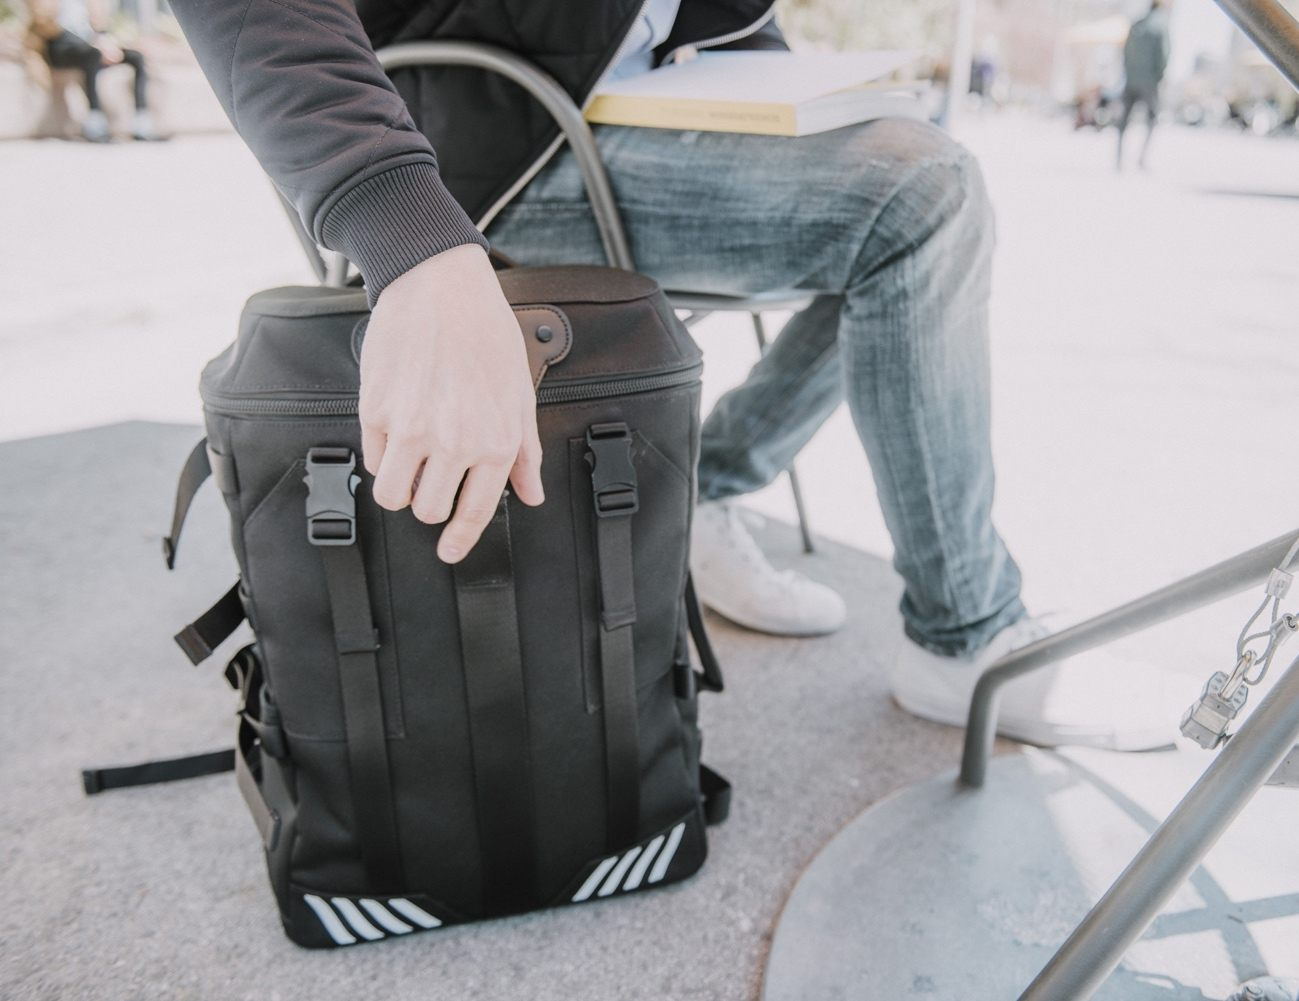 Venque Transformer A Modular Backpack